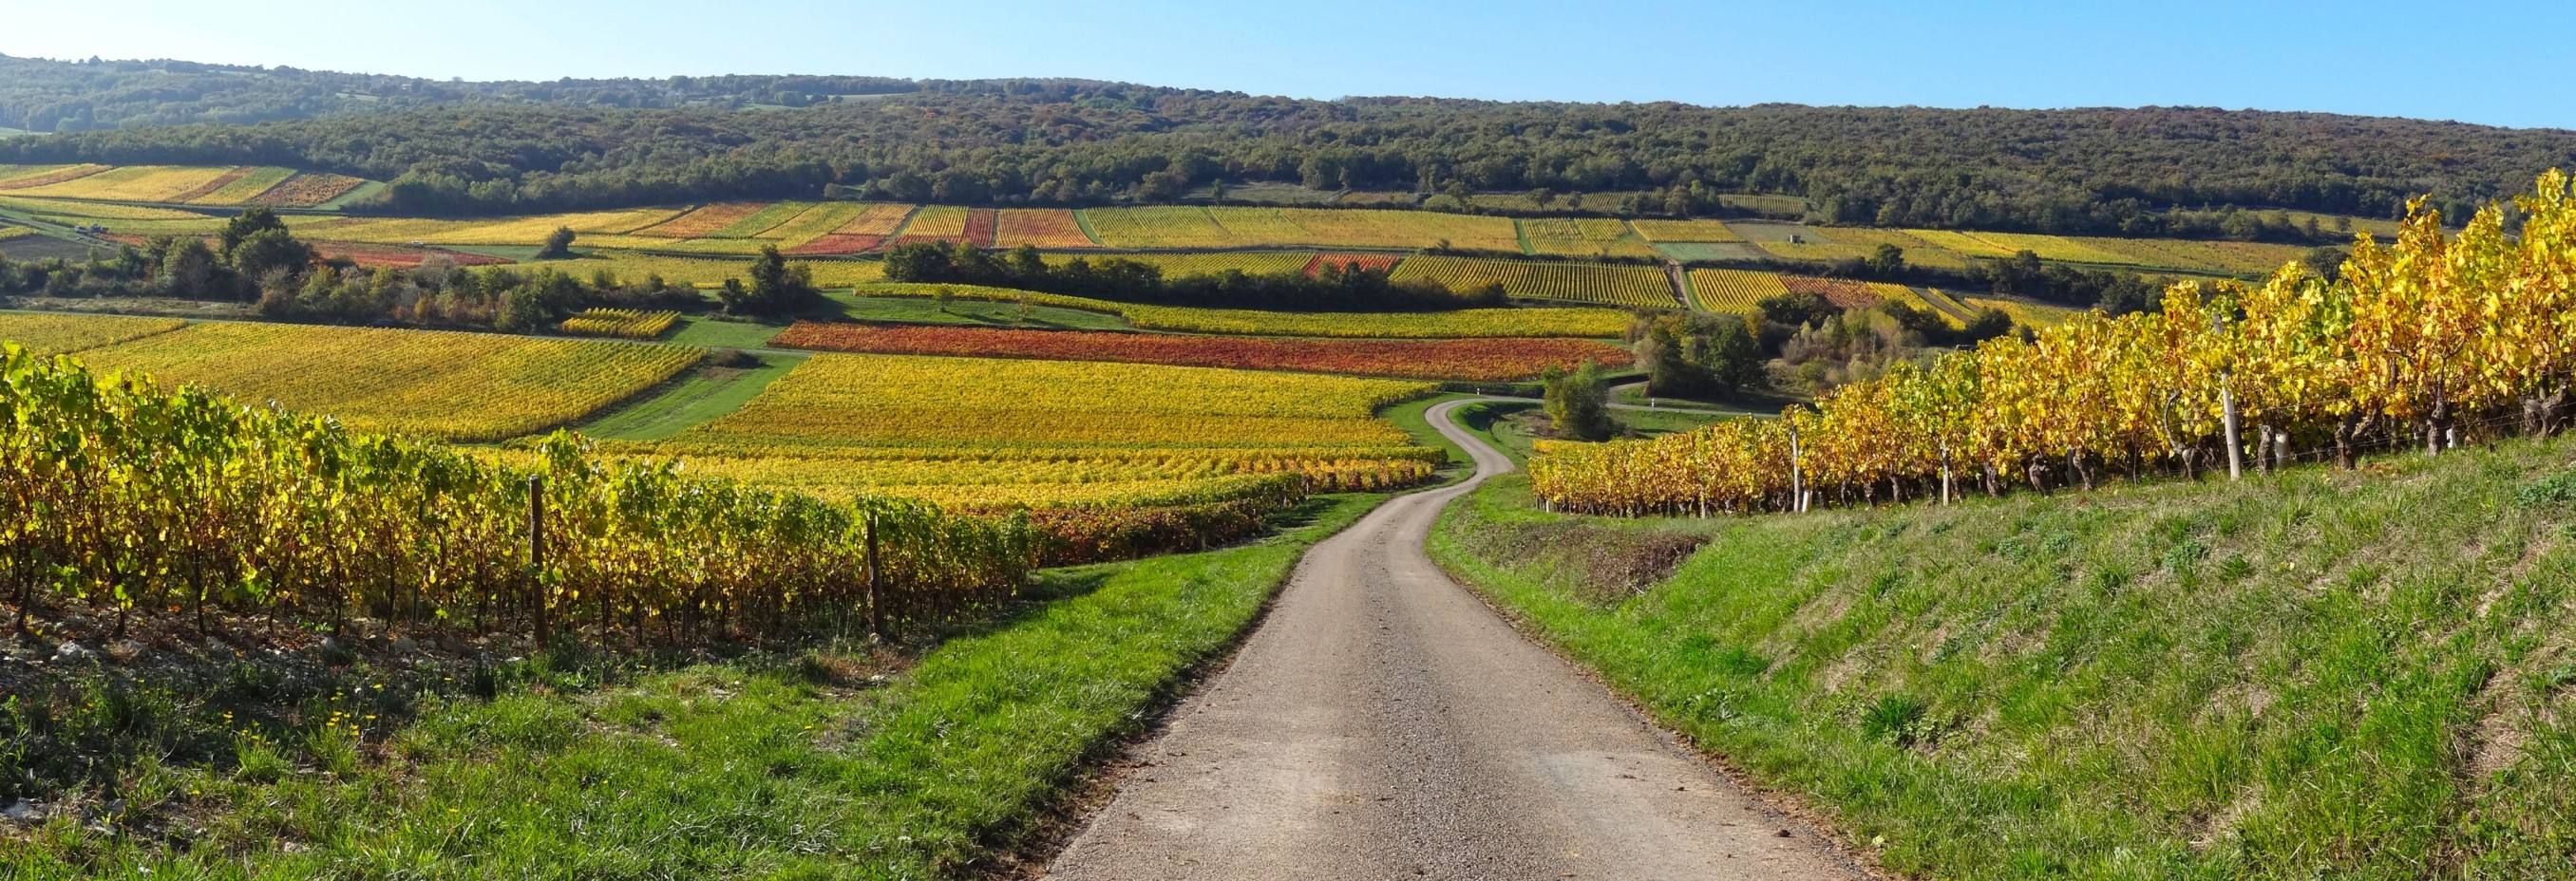 Chemin de vigne